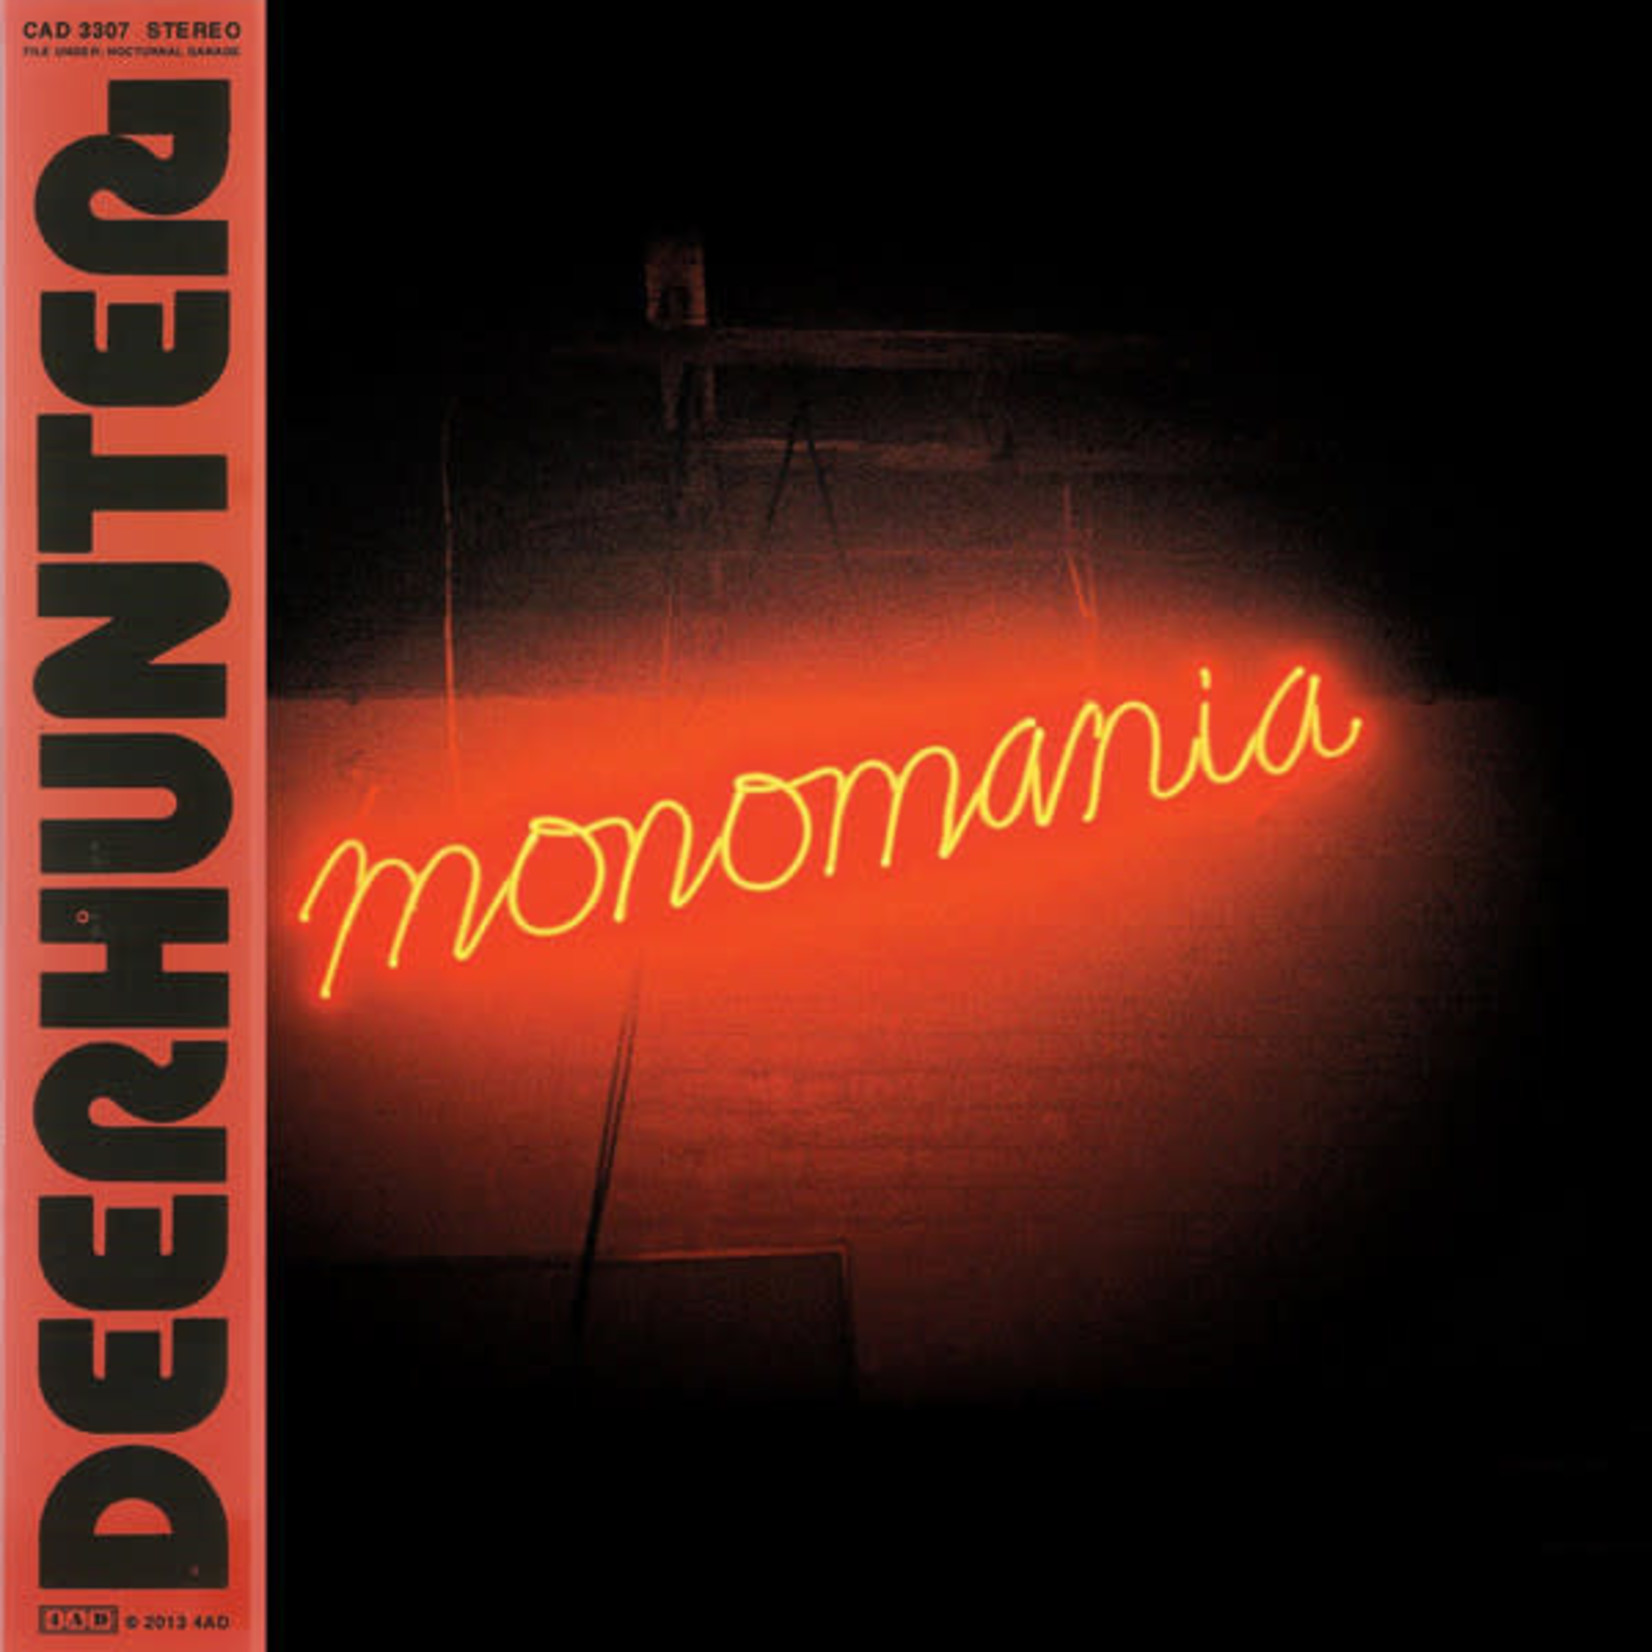 [New] Deerhunter: Monomania (Lp)